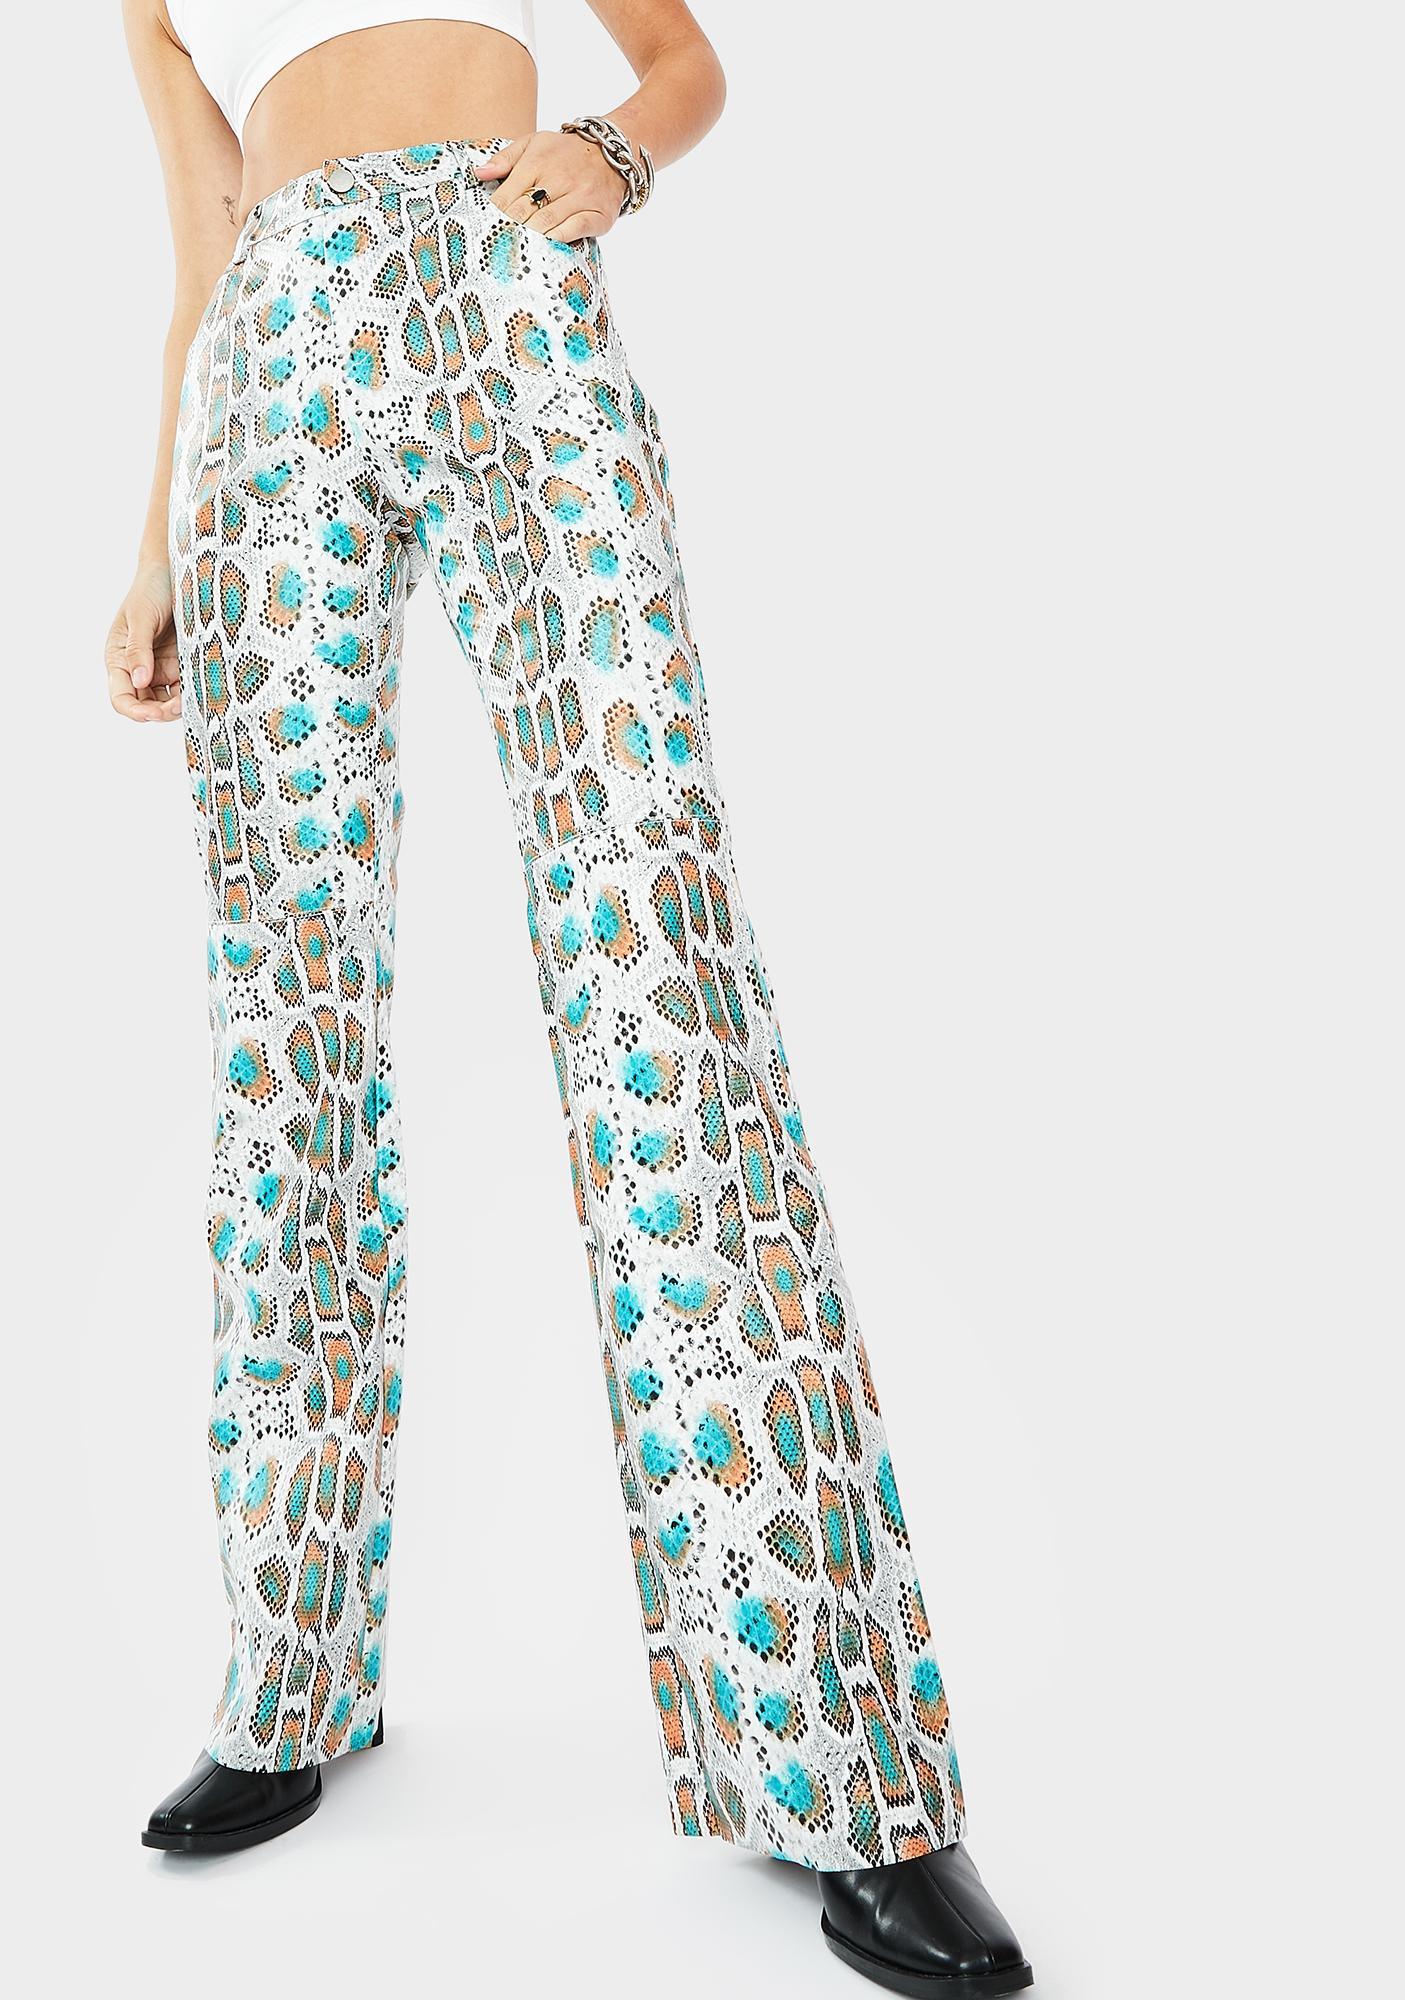 THE KRIPT Ariella Snakeskin Print Pants